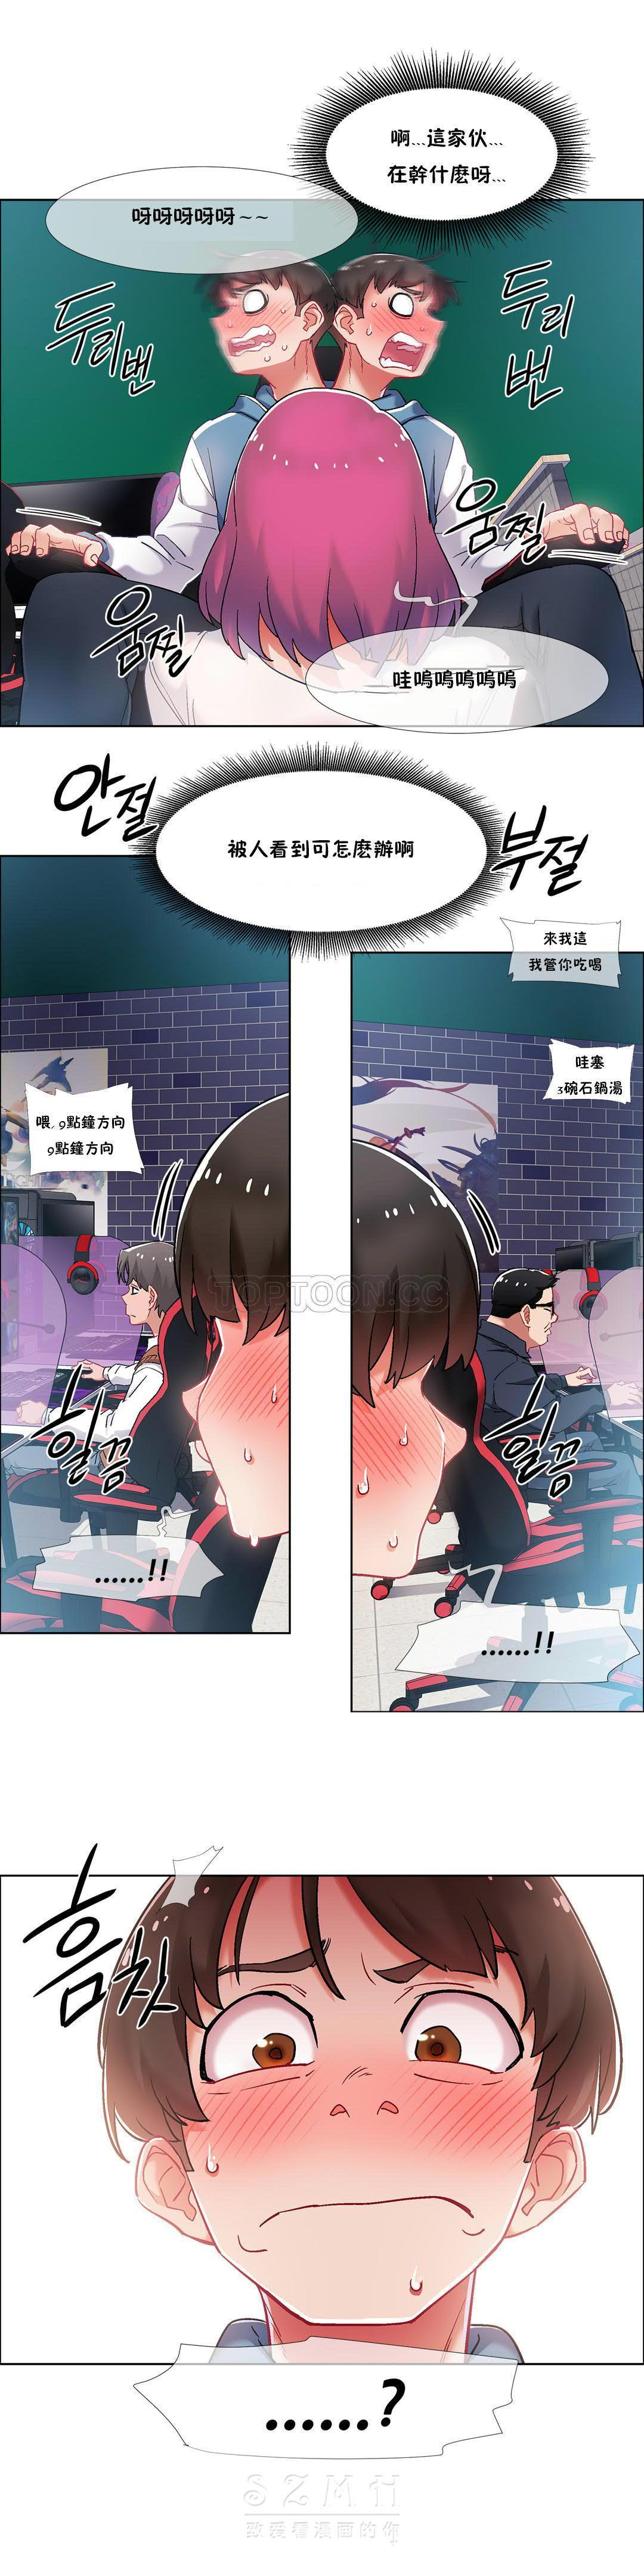 [Studio Wannabe] Rental Girls | 出租女郎 Ch. 33-58 [Chinese]  第二季 完结 30